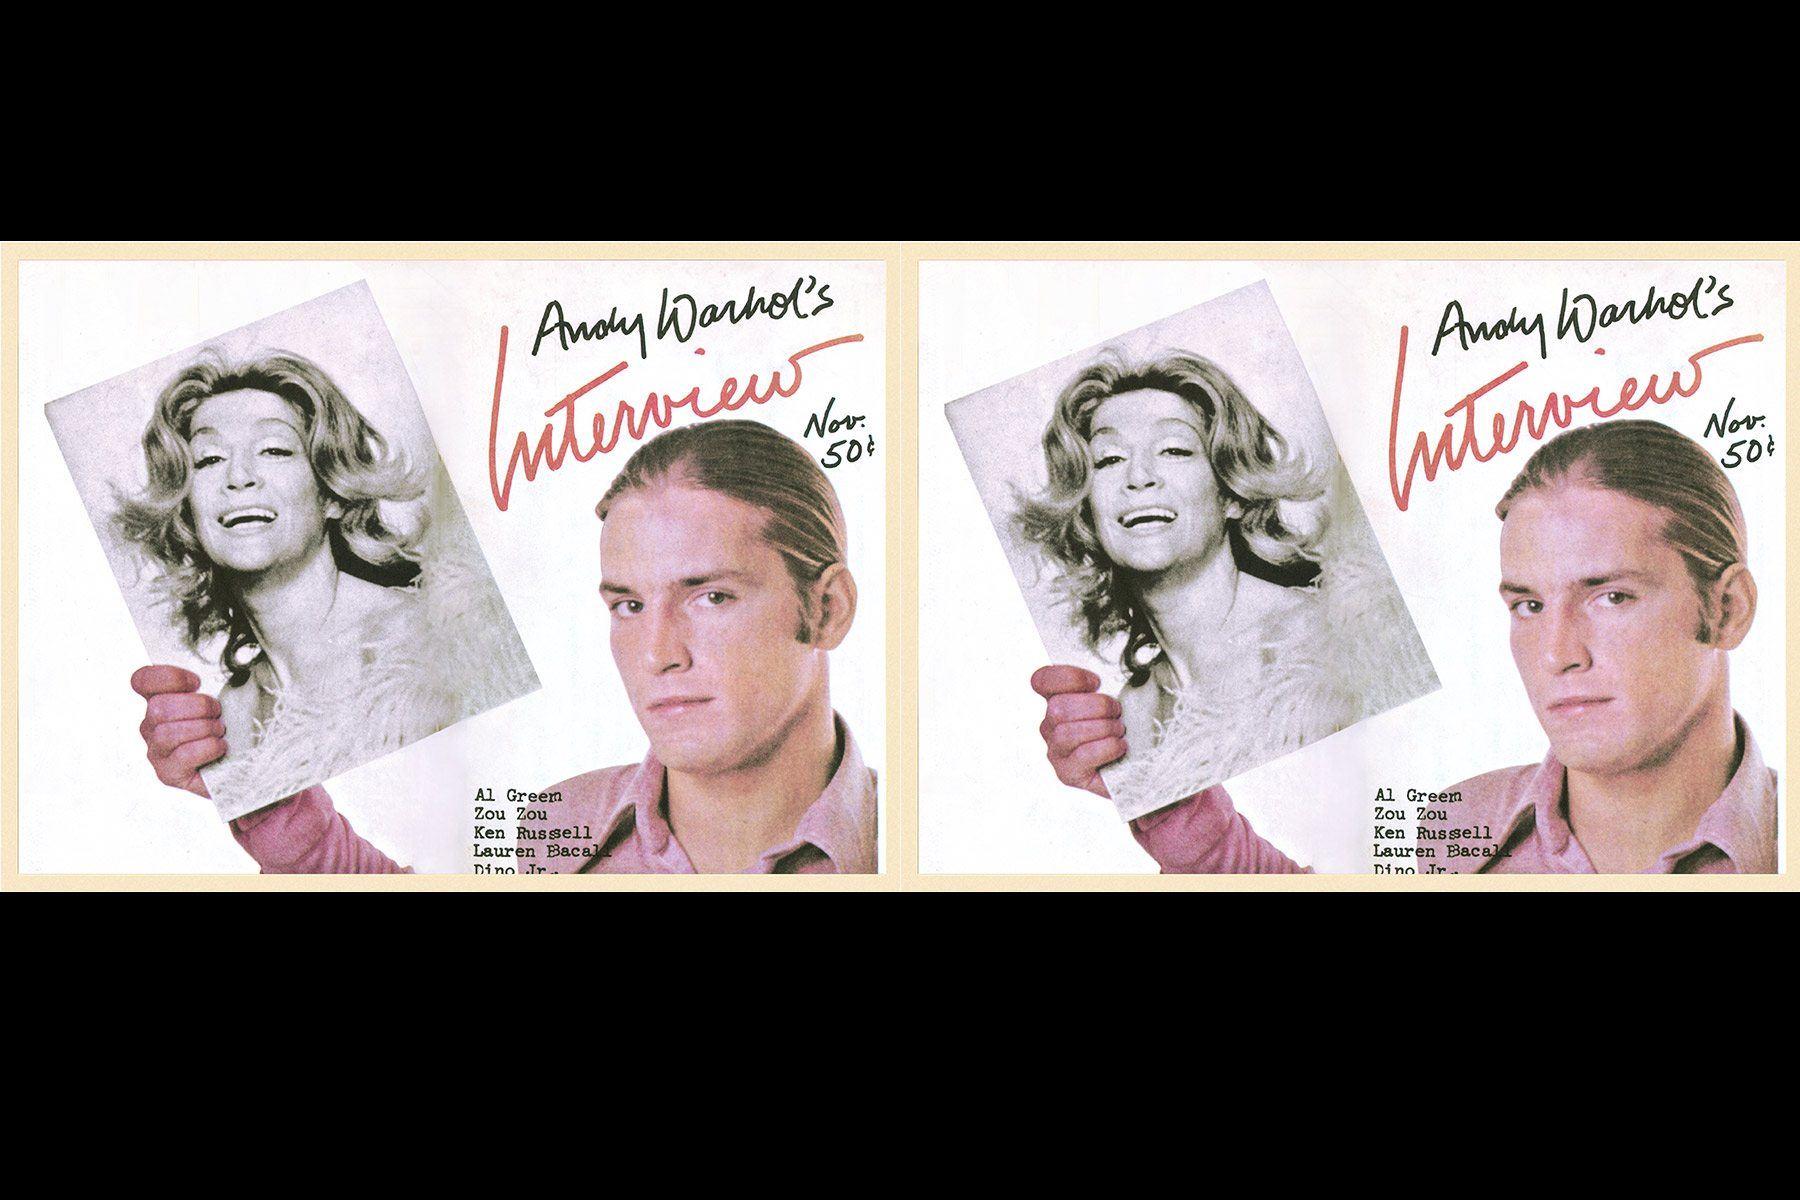 Sylvia Miles and Joe Dallesandro Interview magazine cover by Richard Bernstein. Starmaker by Roger Padhila & Mauricio Padhila. Rizzoli Books. Ponyboy magazine.